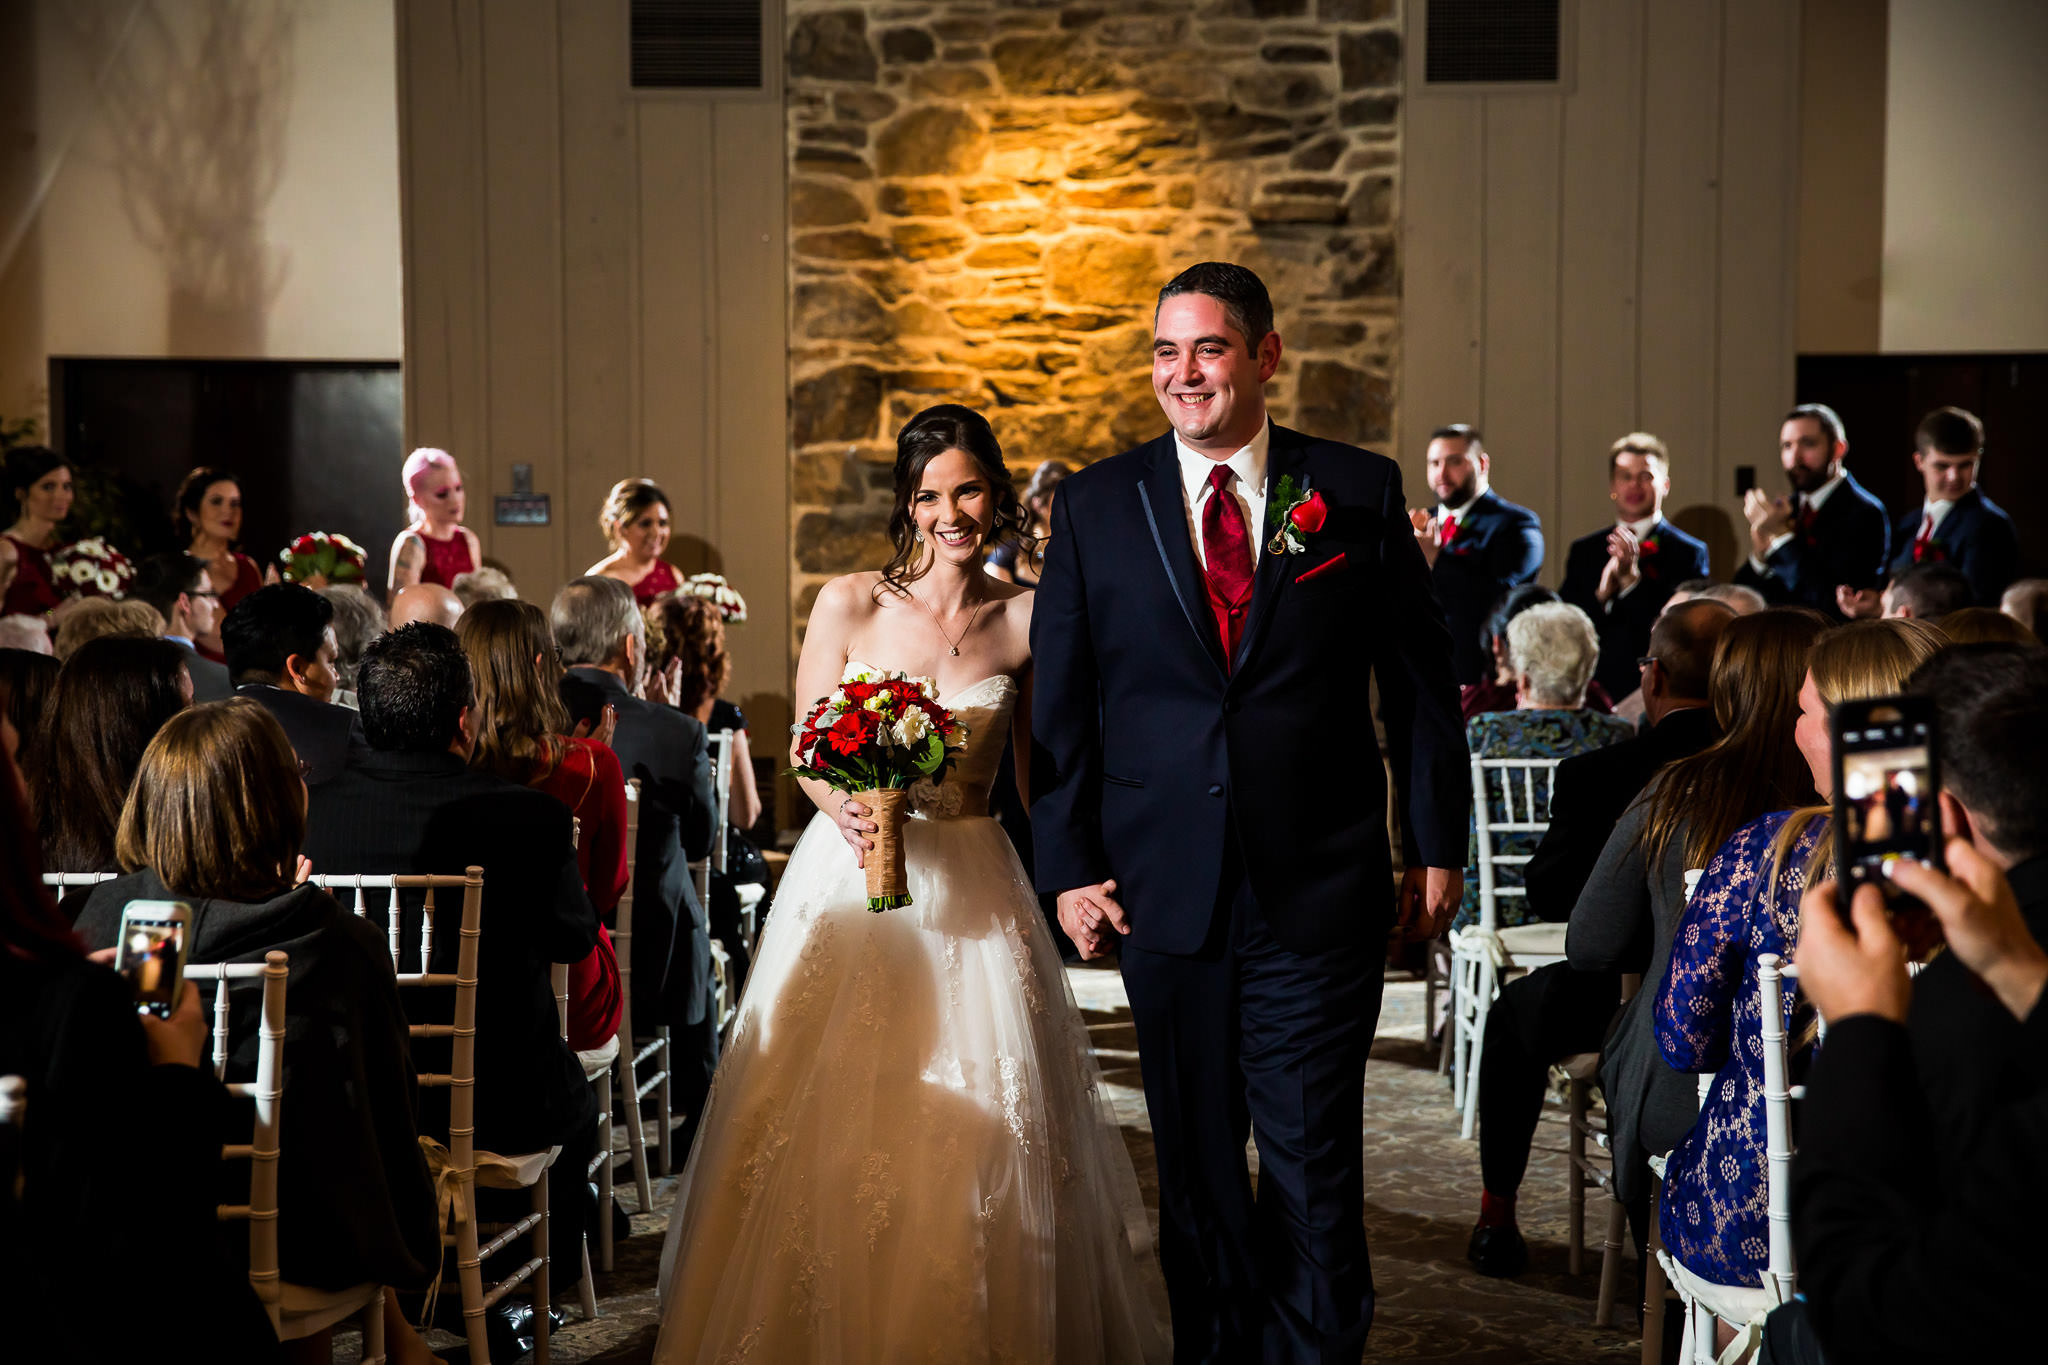 2016-12-10 - Grosso-Stock Wedding-0017.jpg